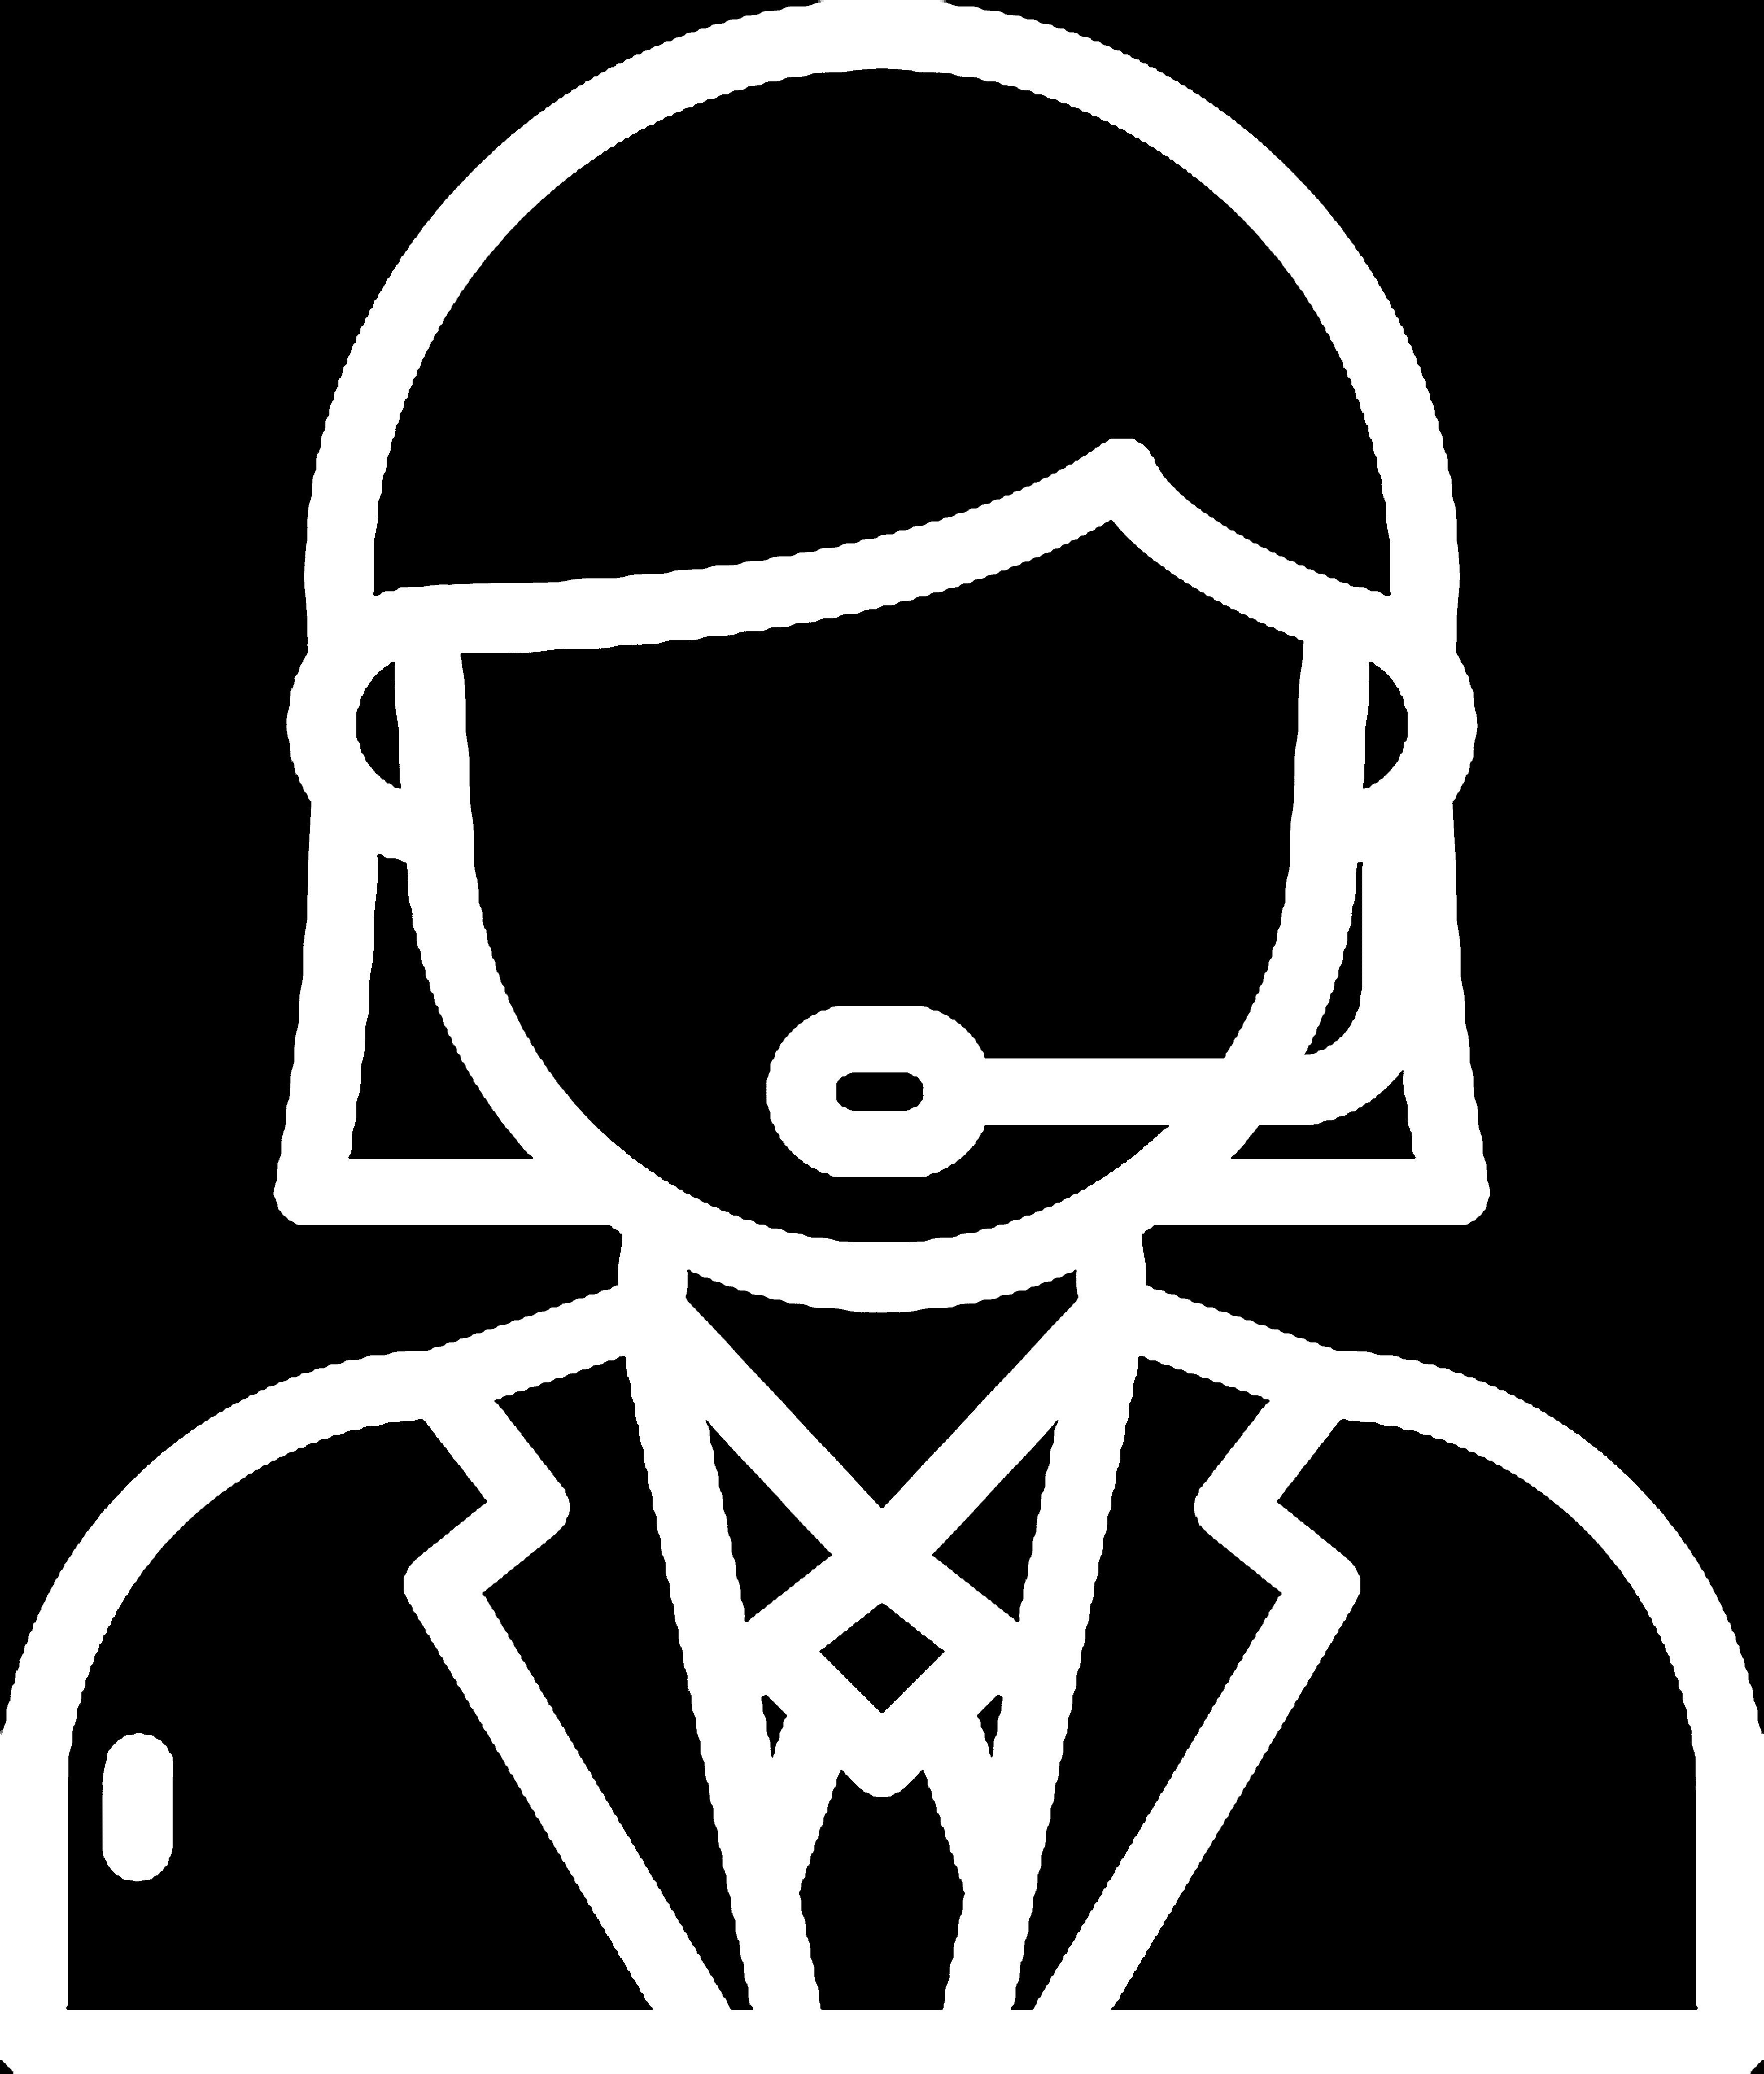 icone 12